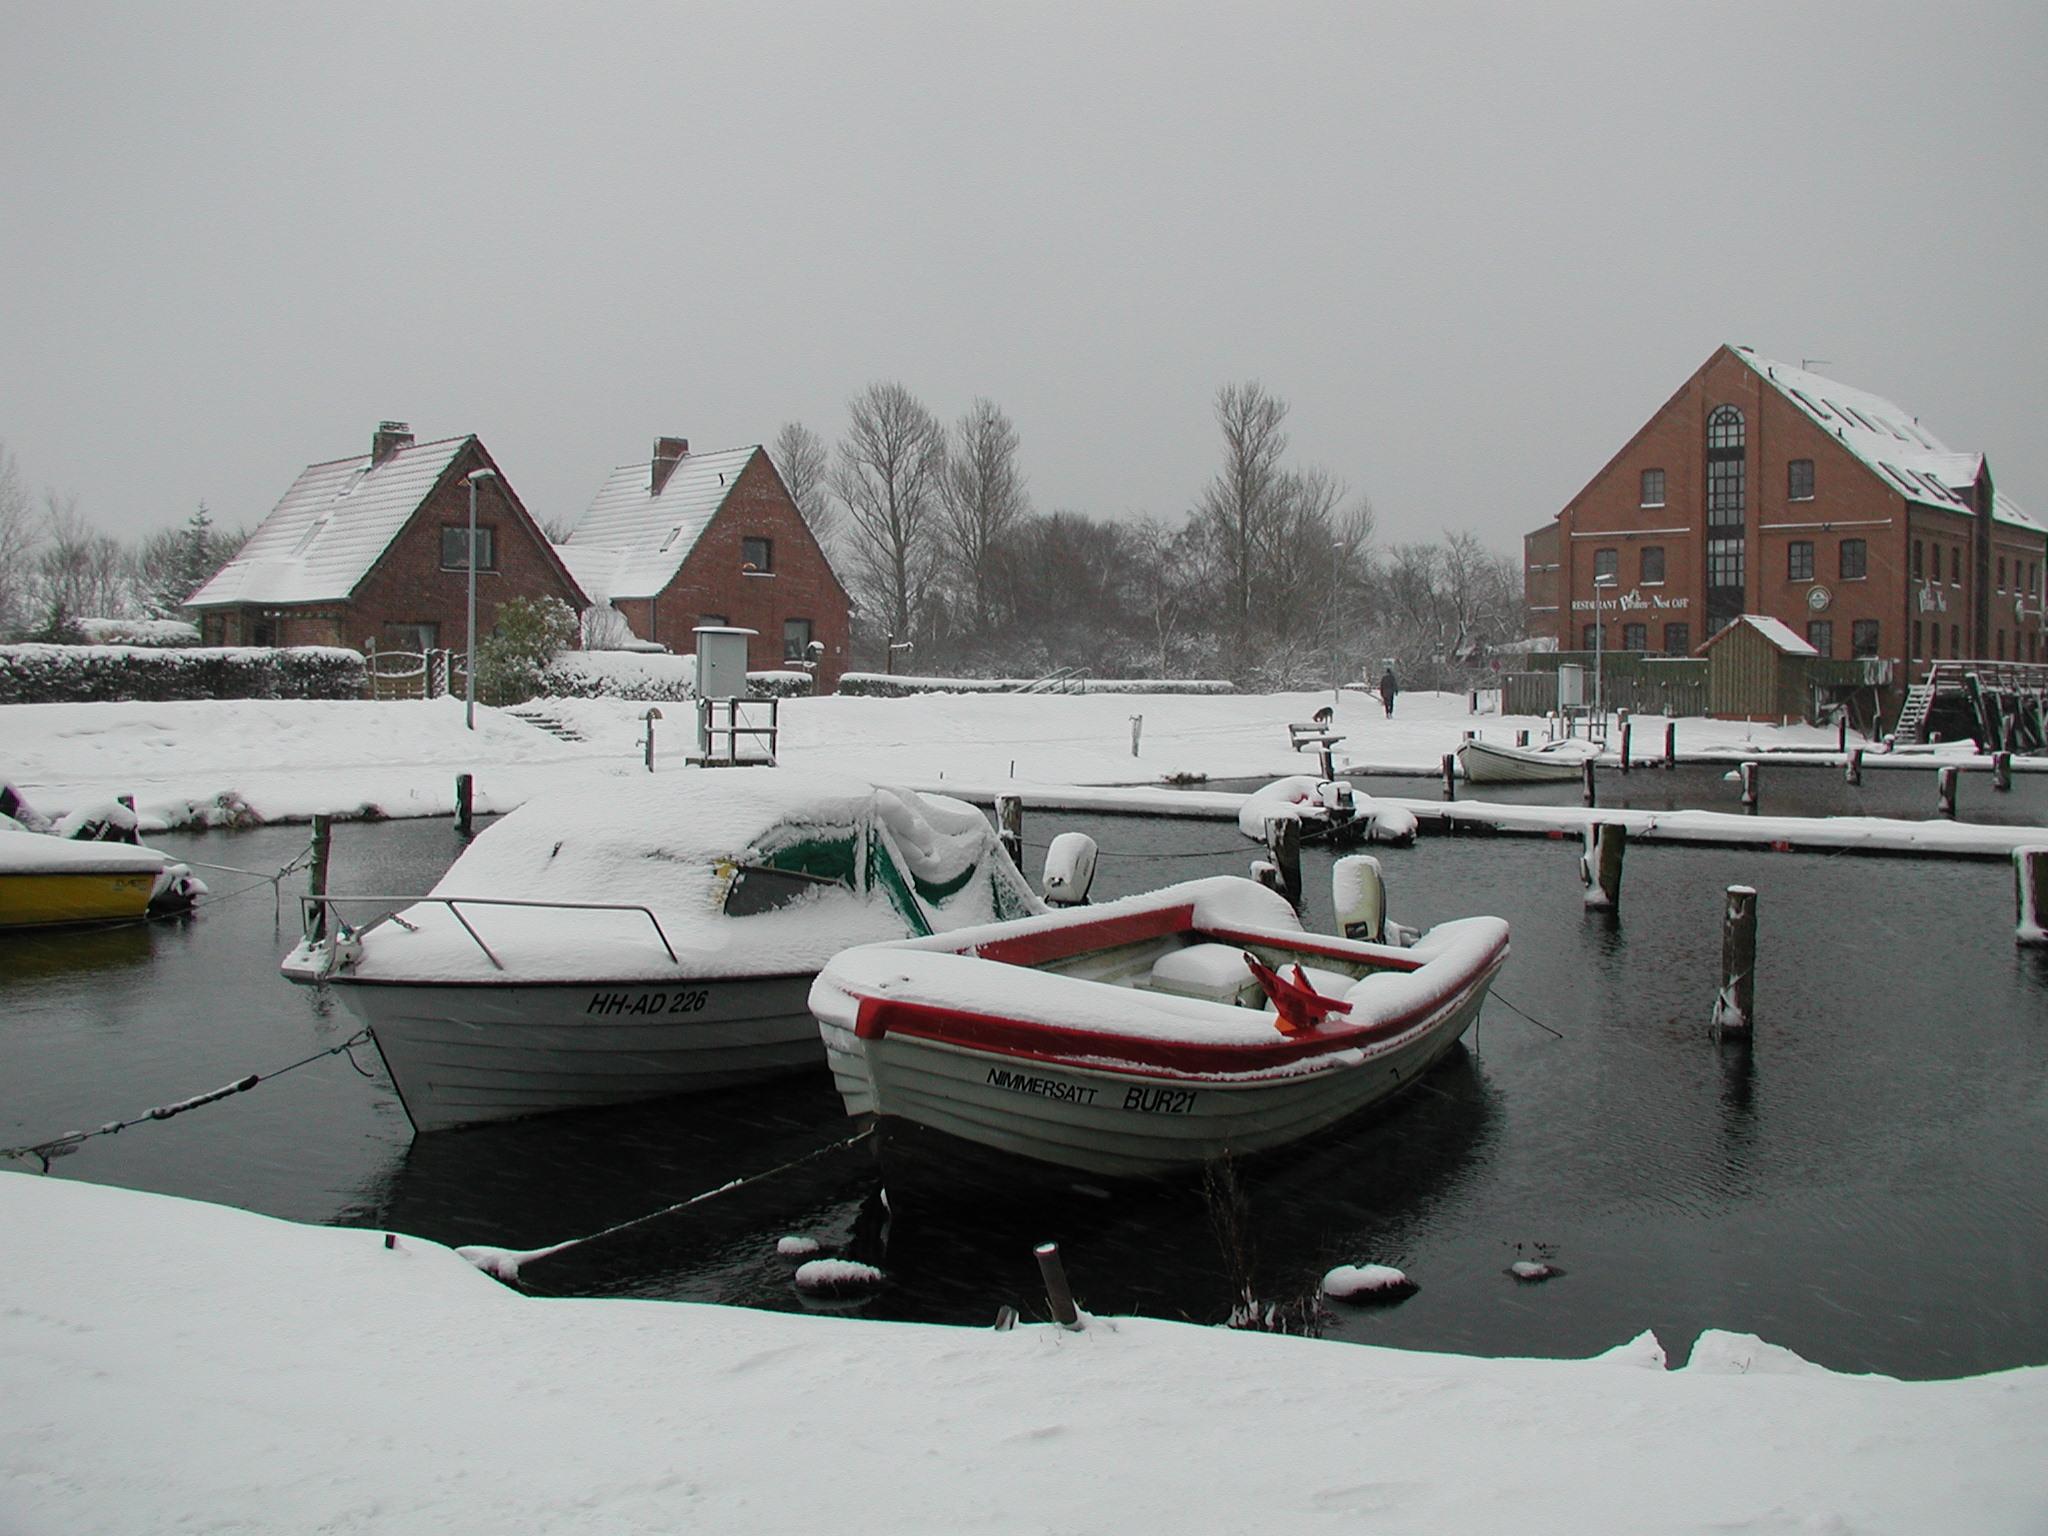 Hafen Orth im Winter, Winteridylle